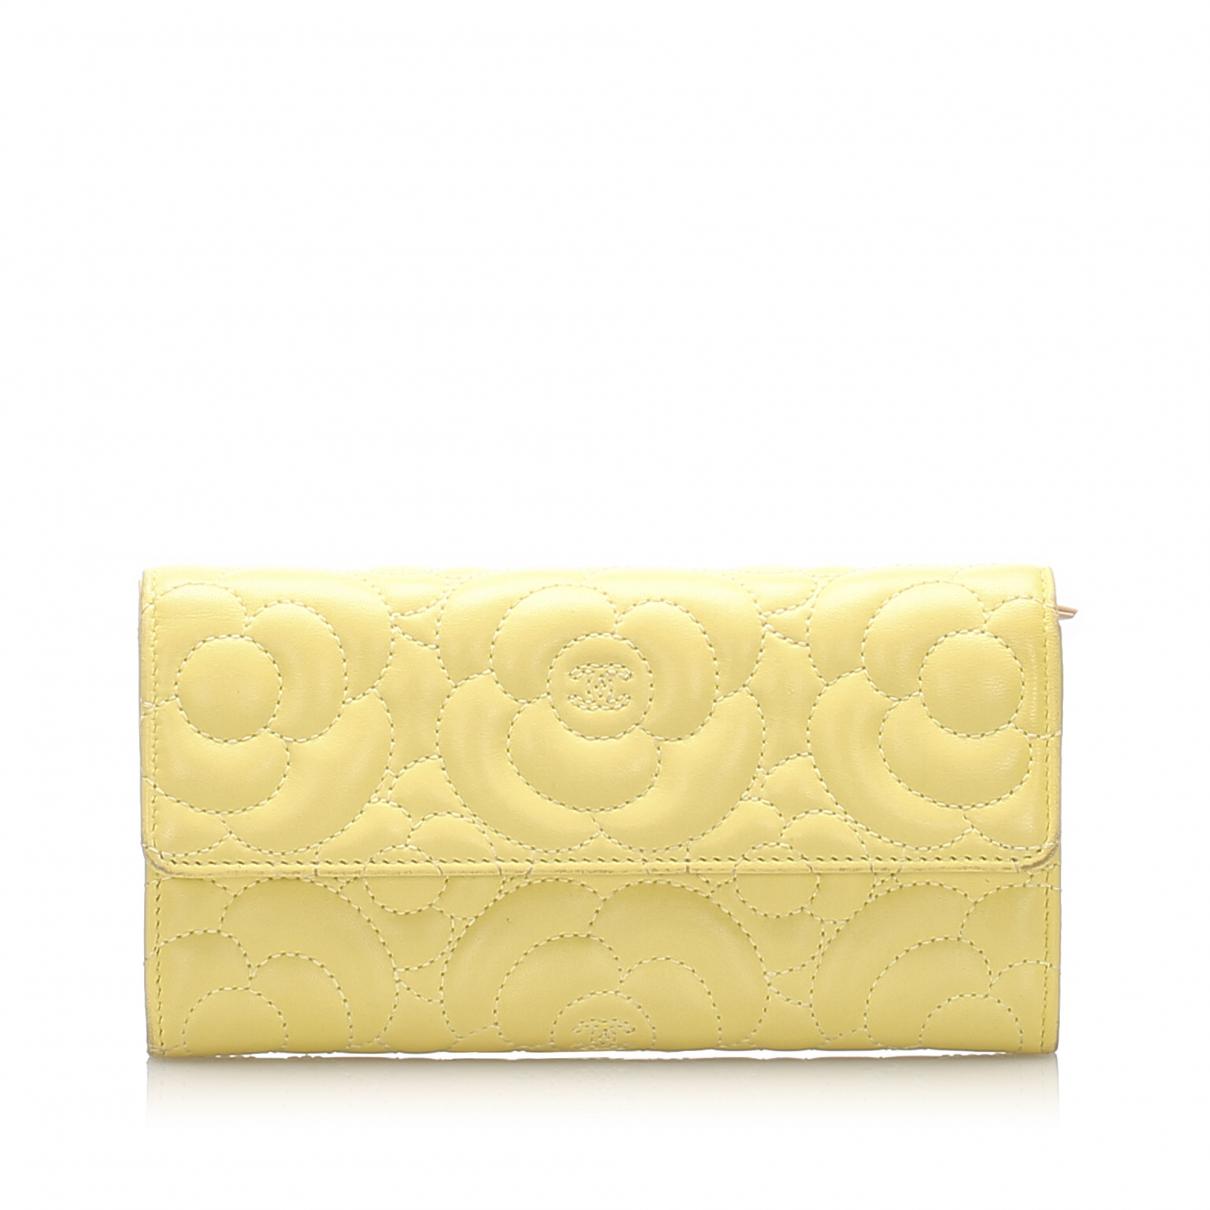 Chanel \N Portemonnaie in  Gelb Leder